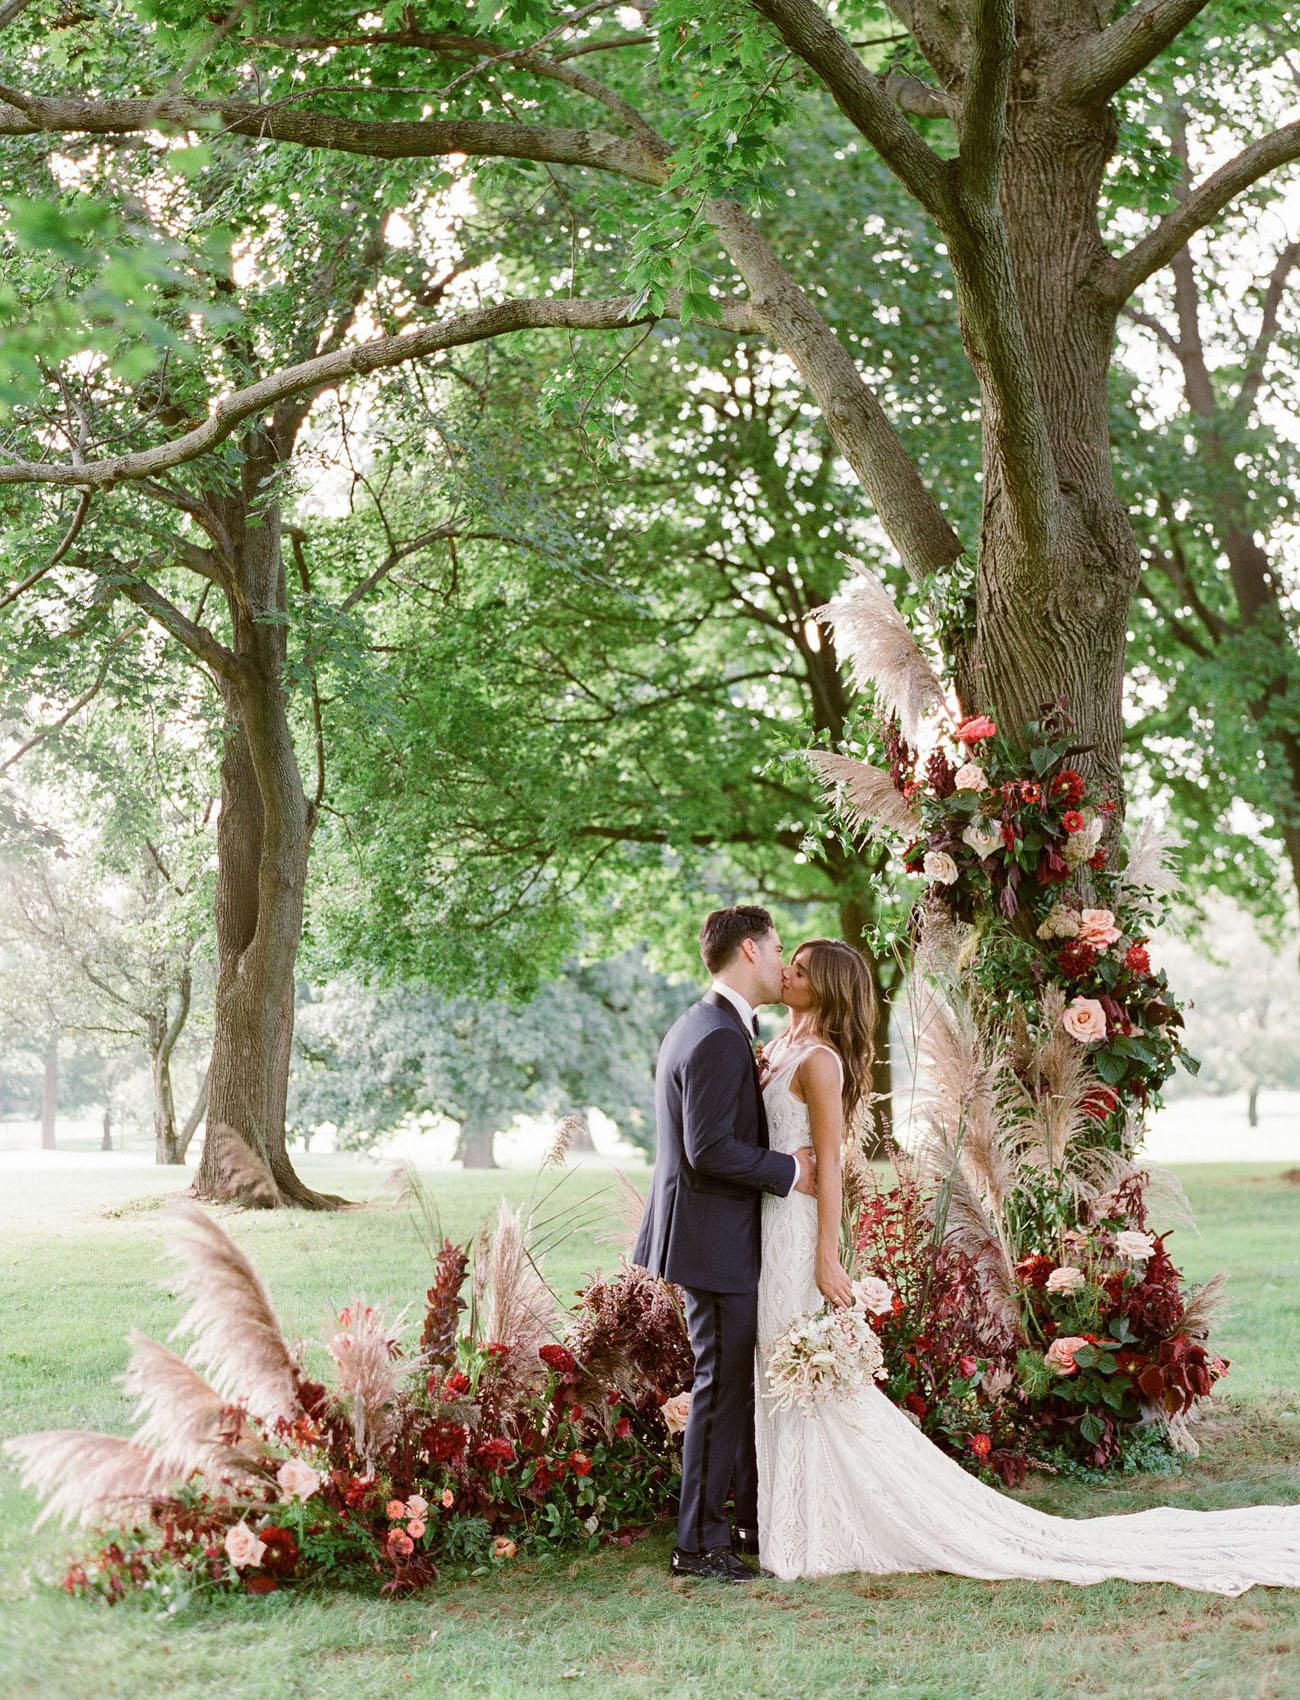 10 Tips to Throw Your Dream Backyard Wedding | Green ...